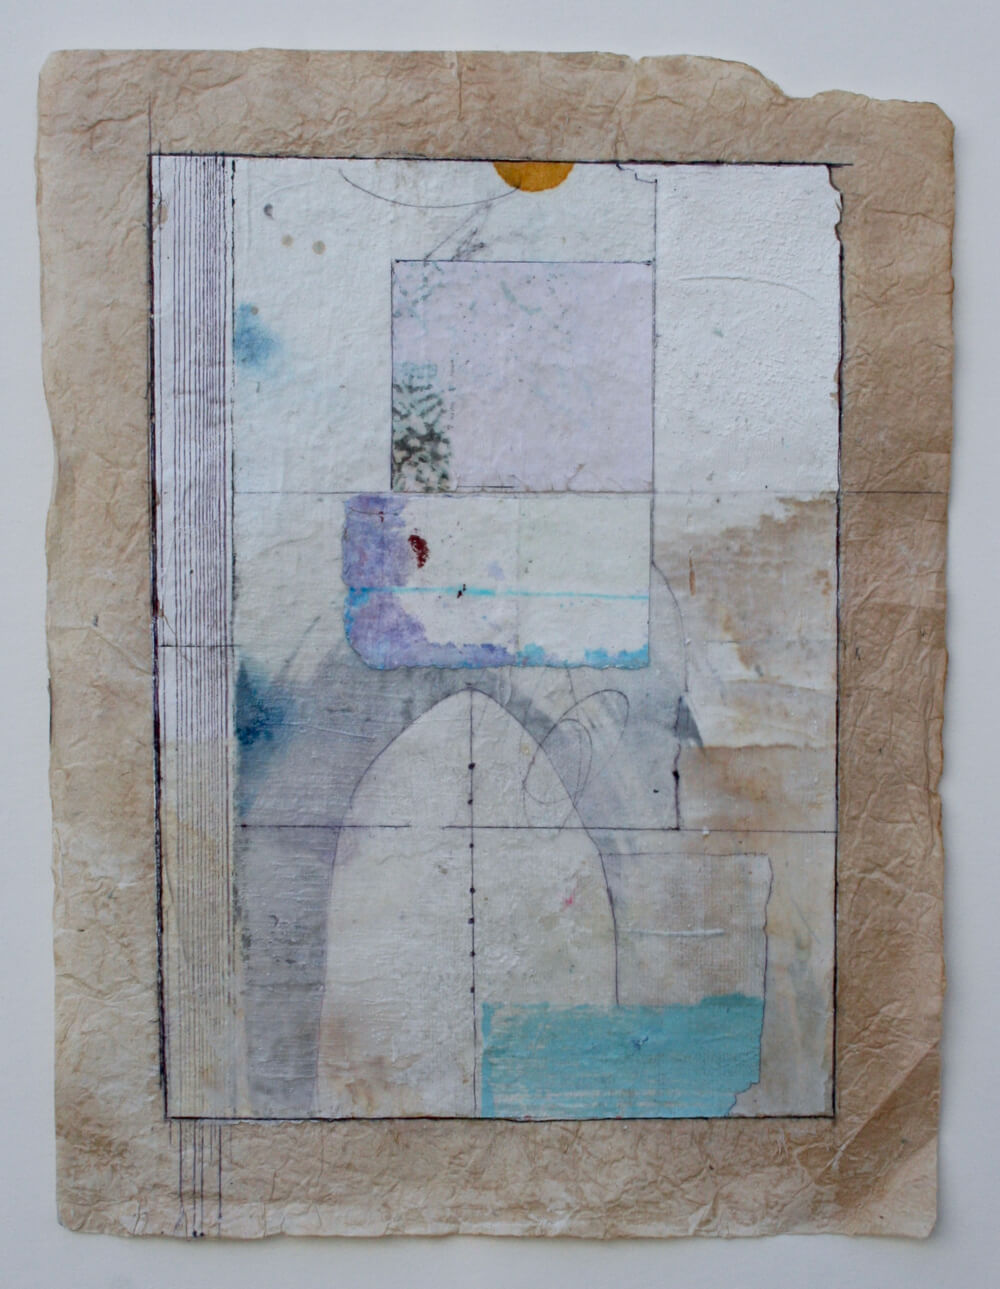 keys series  'immaterial entry'  mixed media on lokta paper  12 x 9  sold  .  .